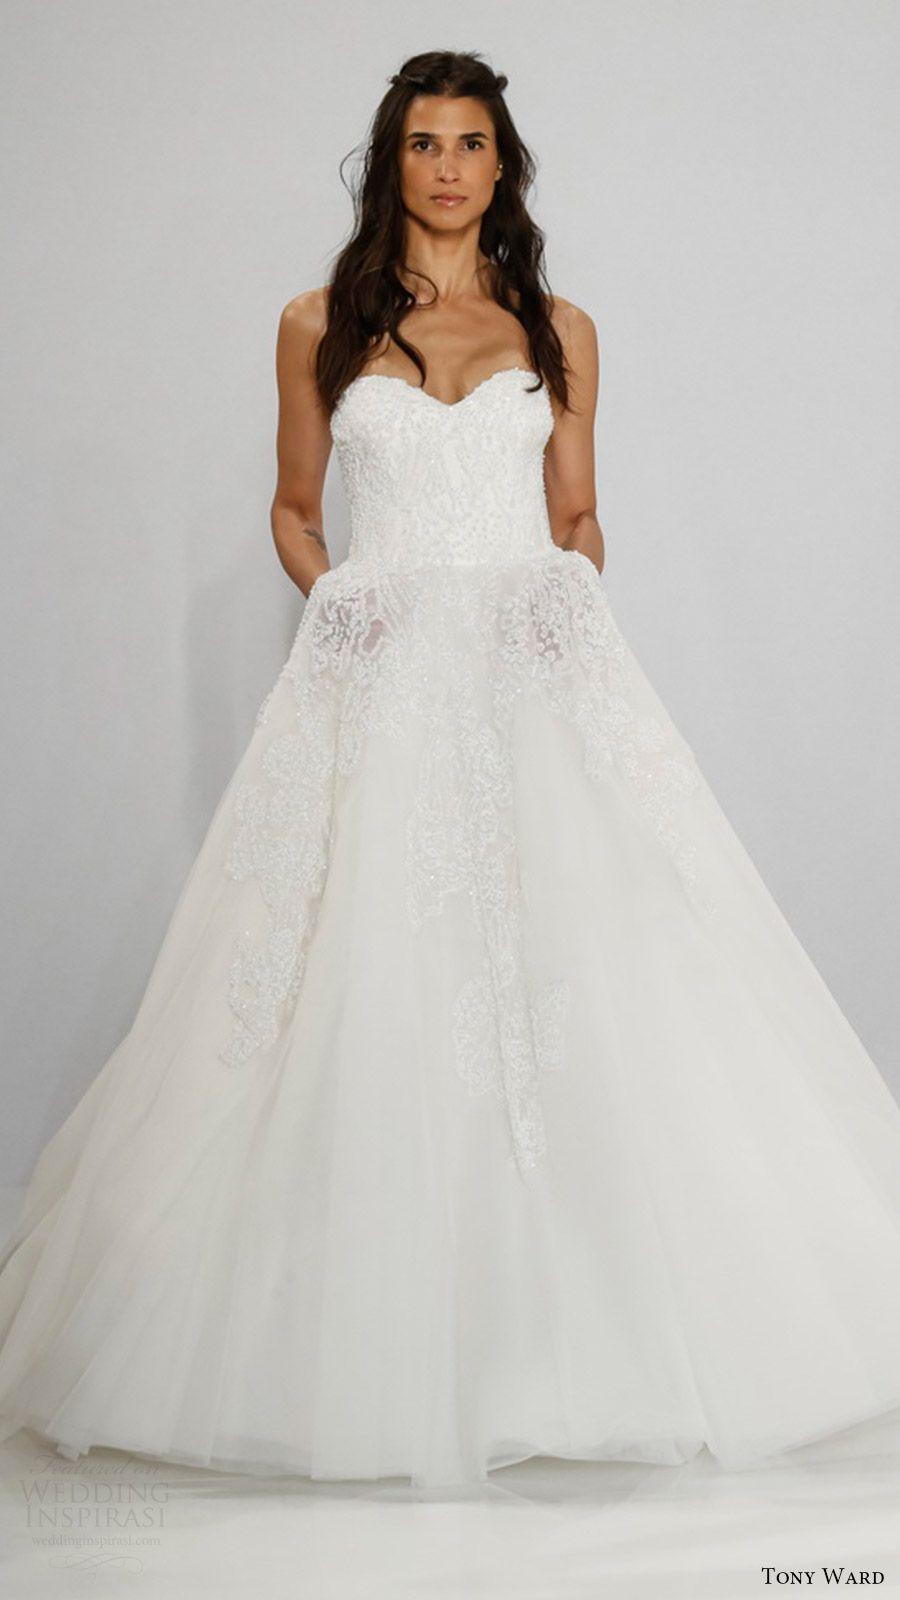 Ball gowns wedding dresses  Tony Ward Bridal  Wedding Dresses  Pinterest  Tony ward bridal